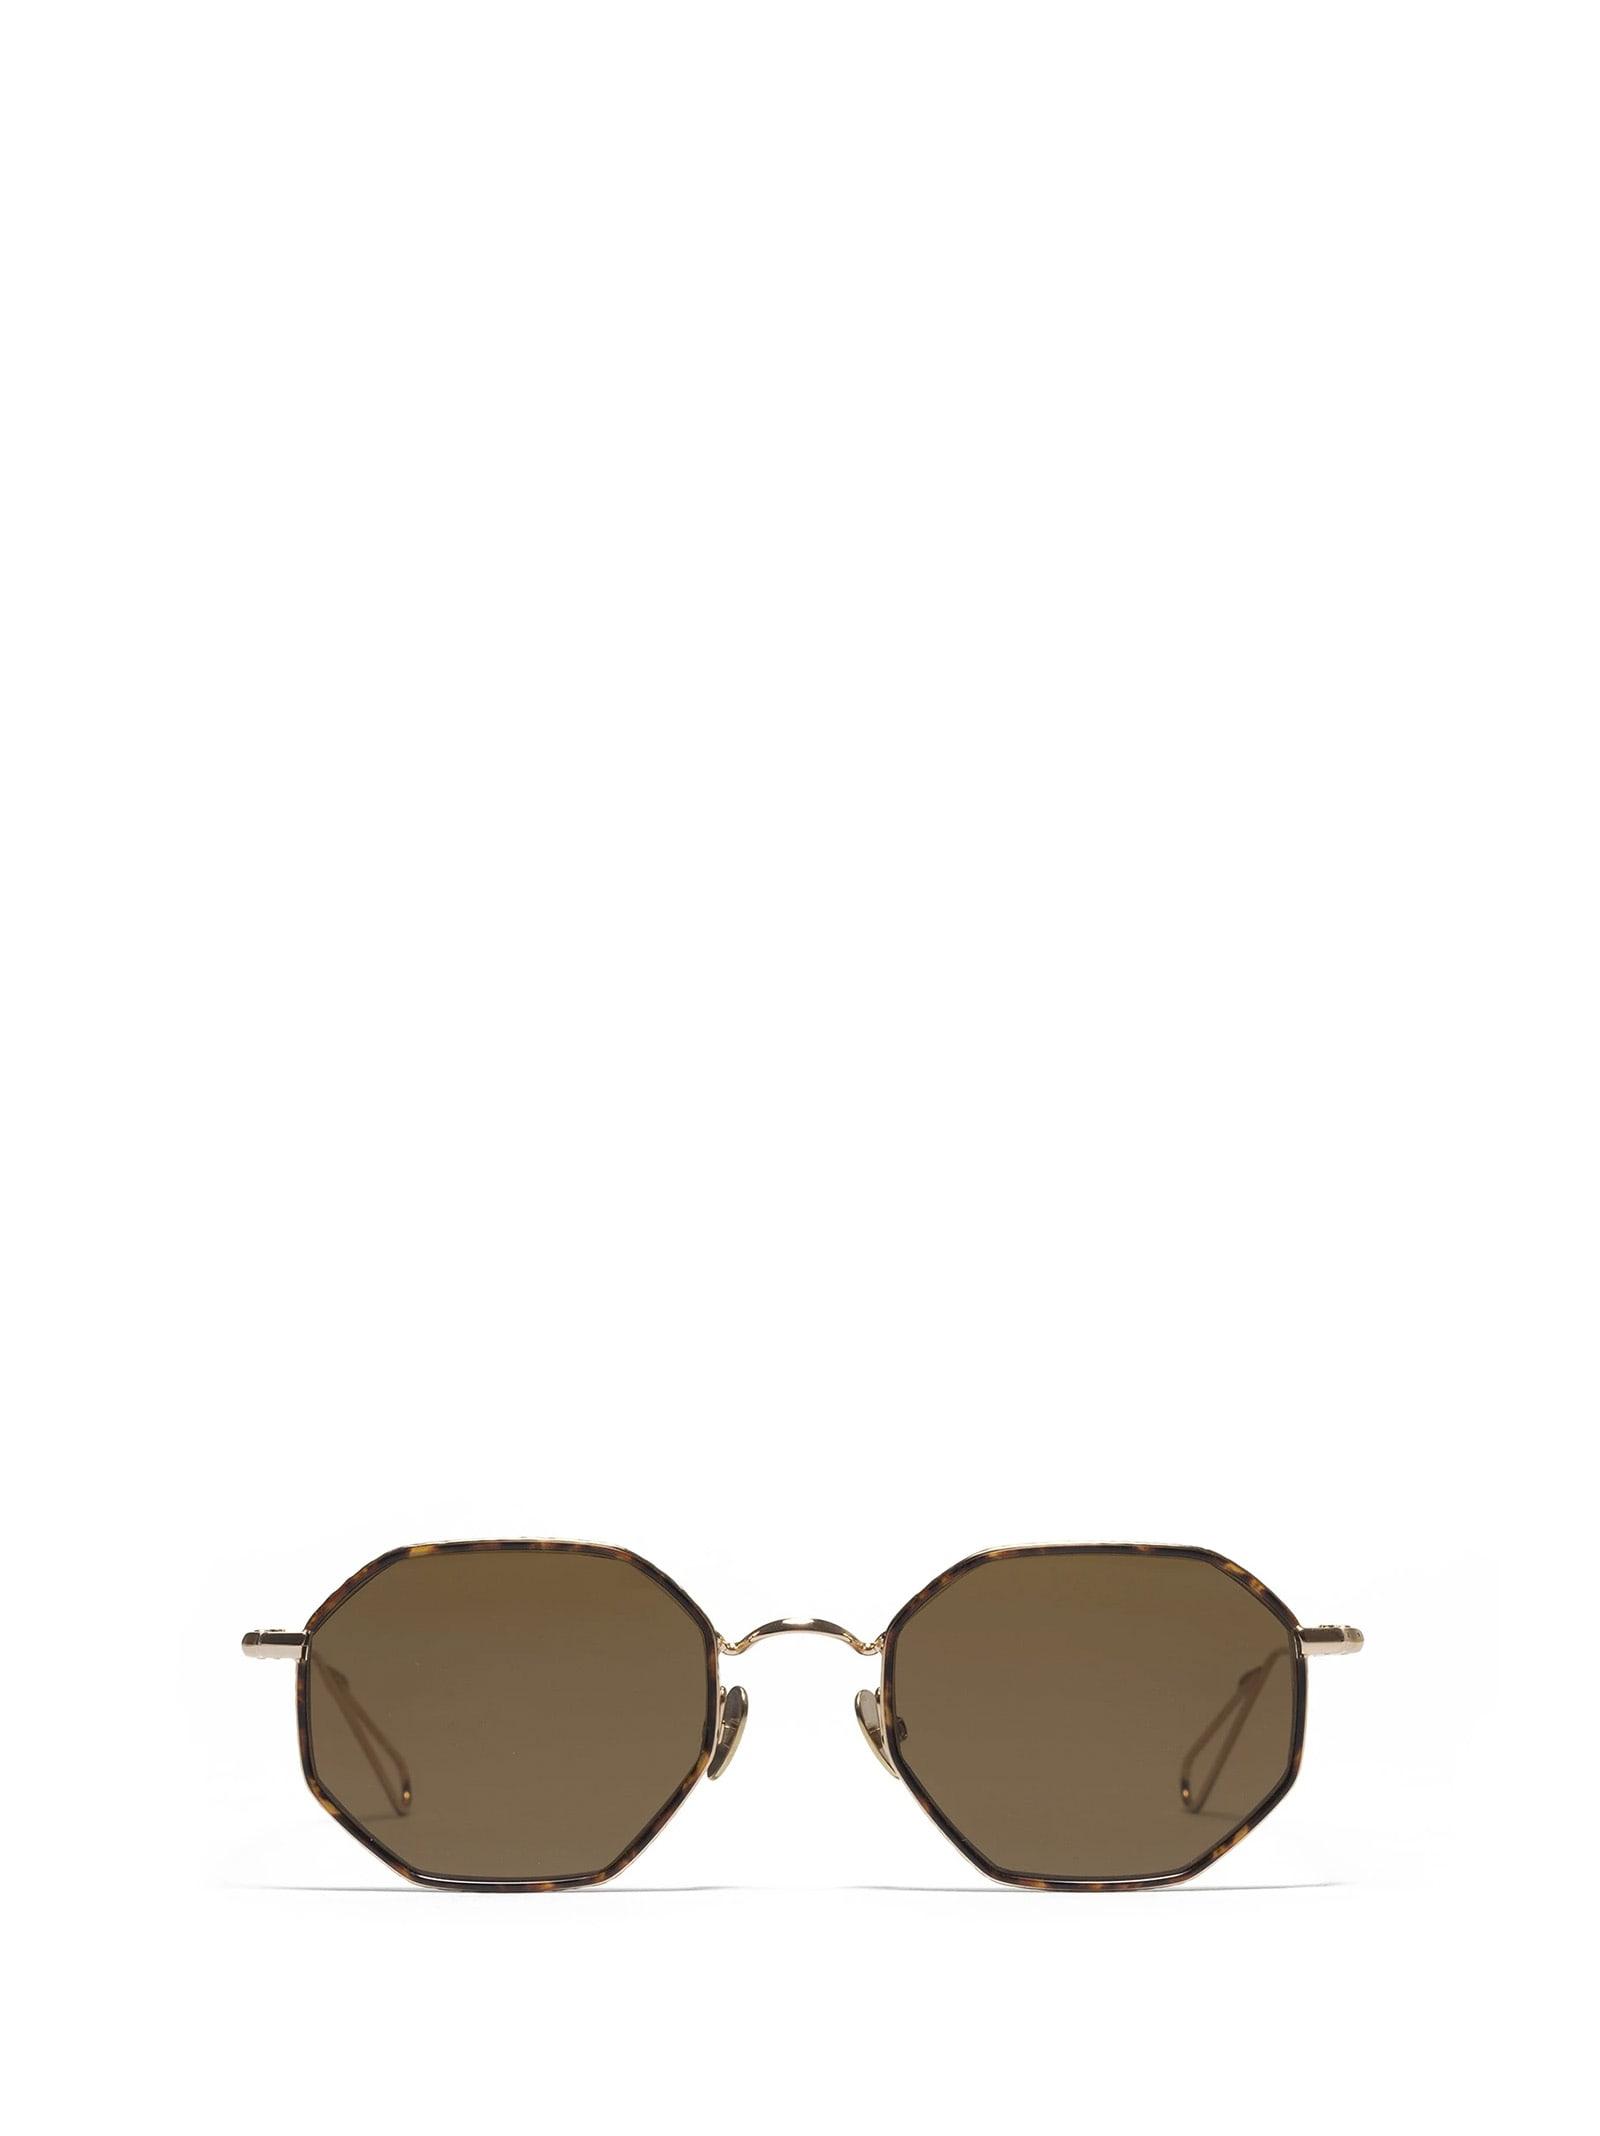 AHLEM Ahlem Luxembourg Champagne Turtle Windsor Sunglasses